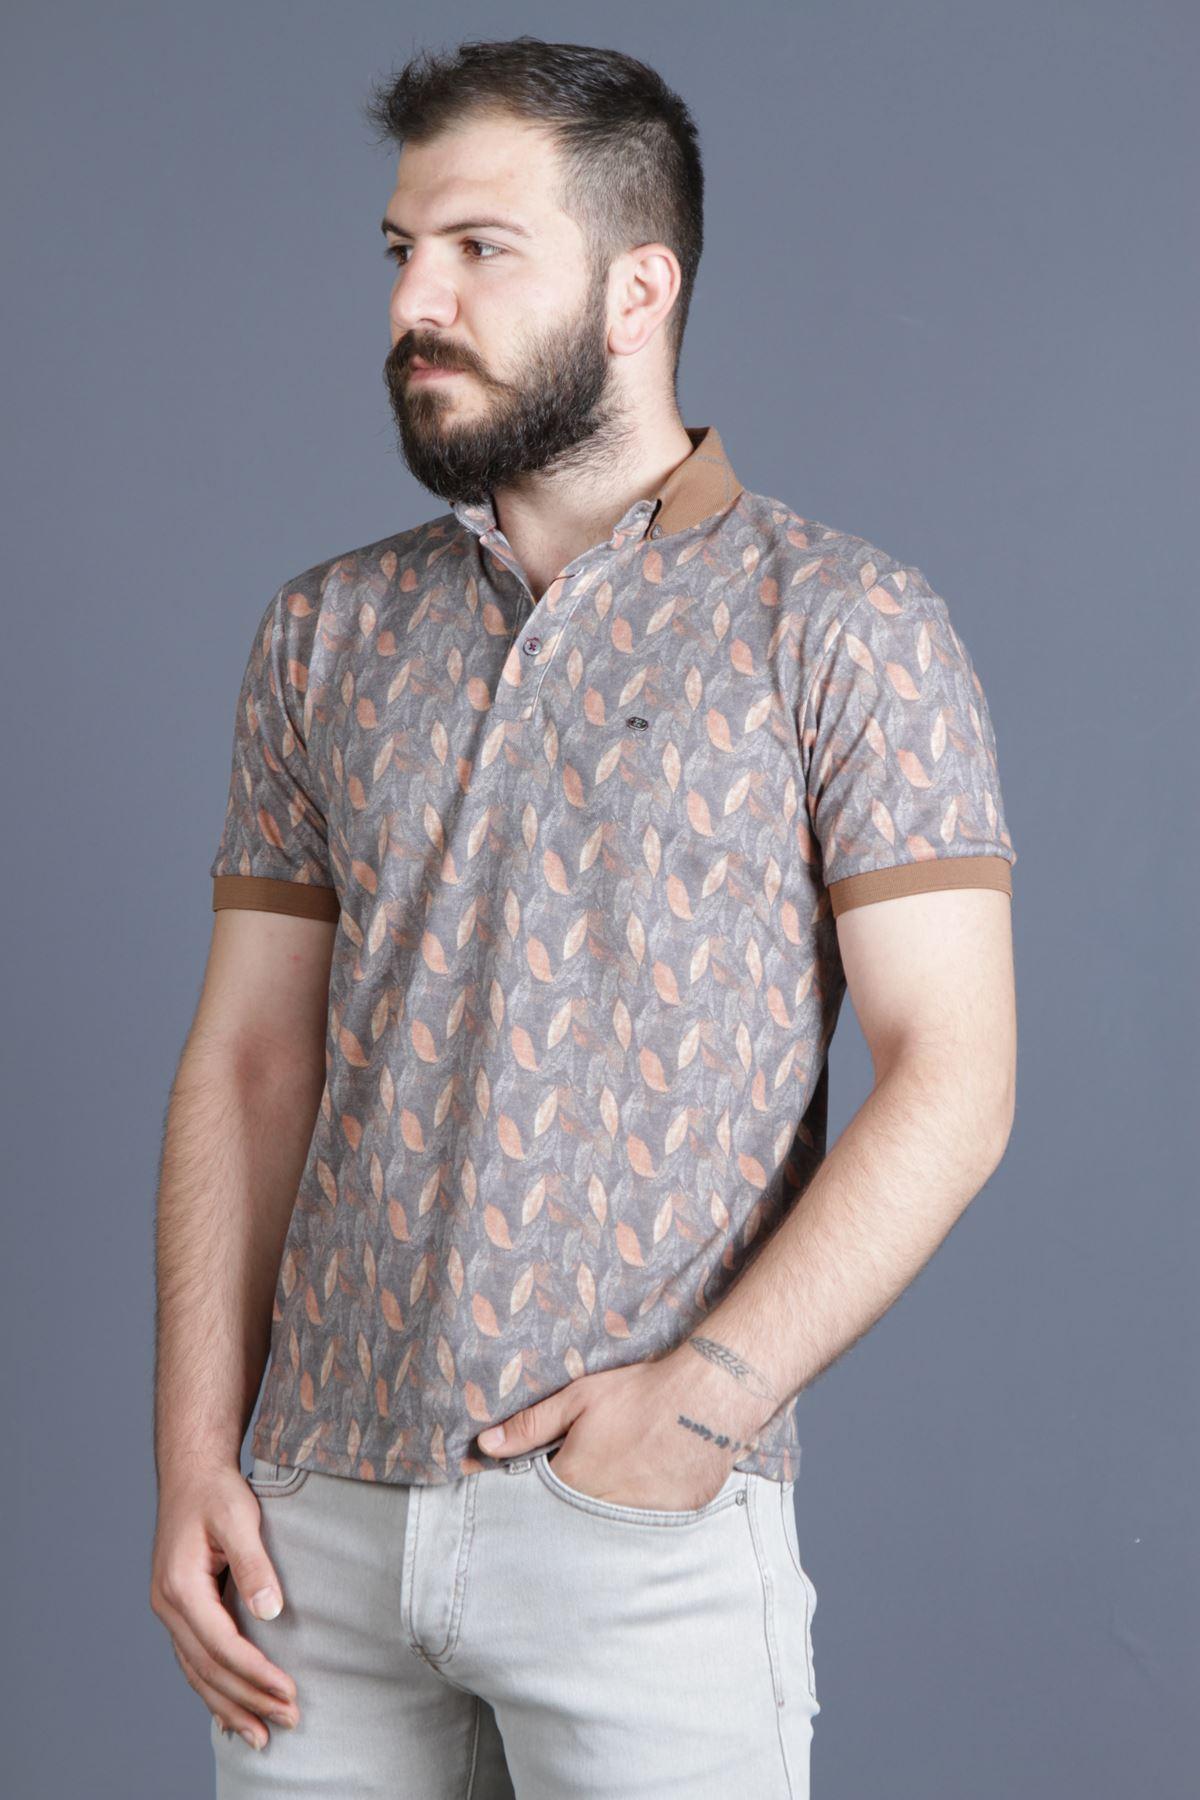 ERKEK TUGRA 40224 YAPRAK DESENLİ POLO YAKA t-shirt erkek